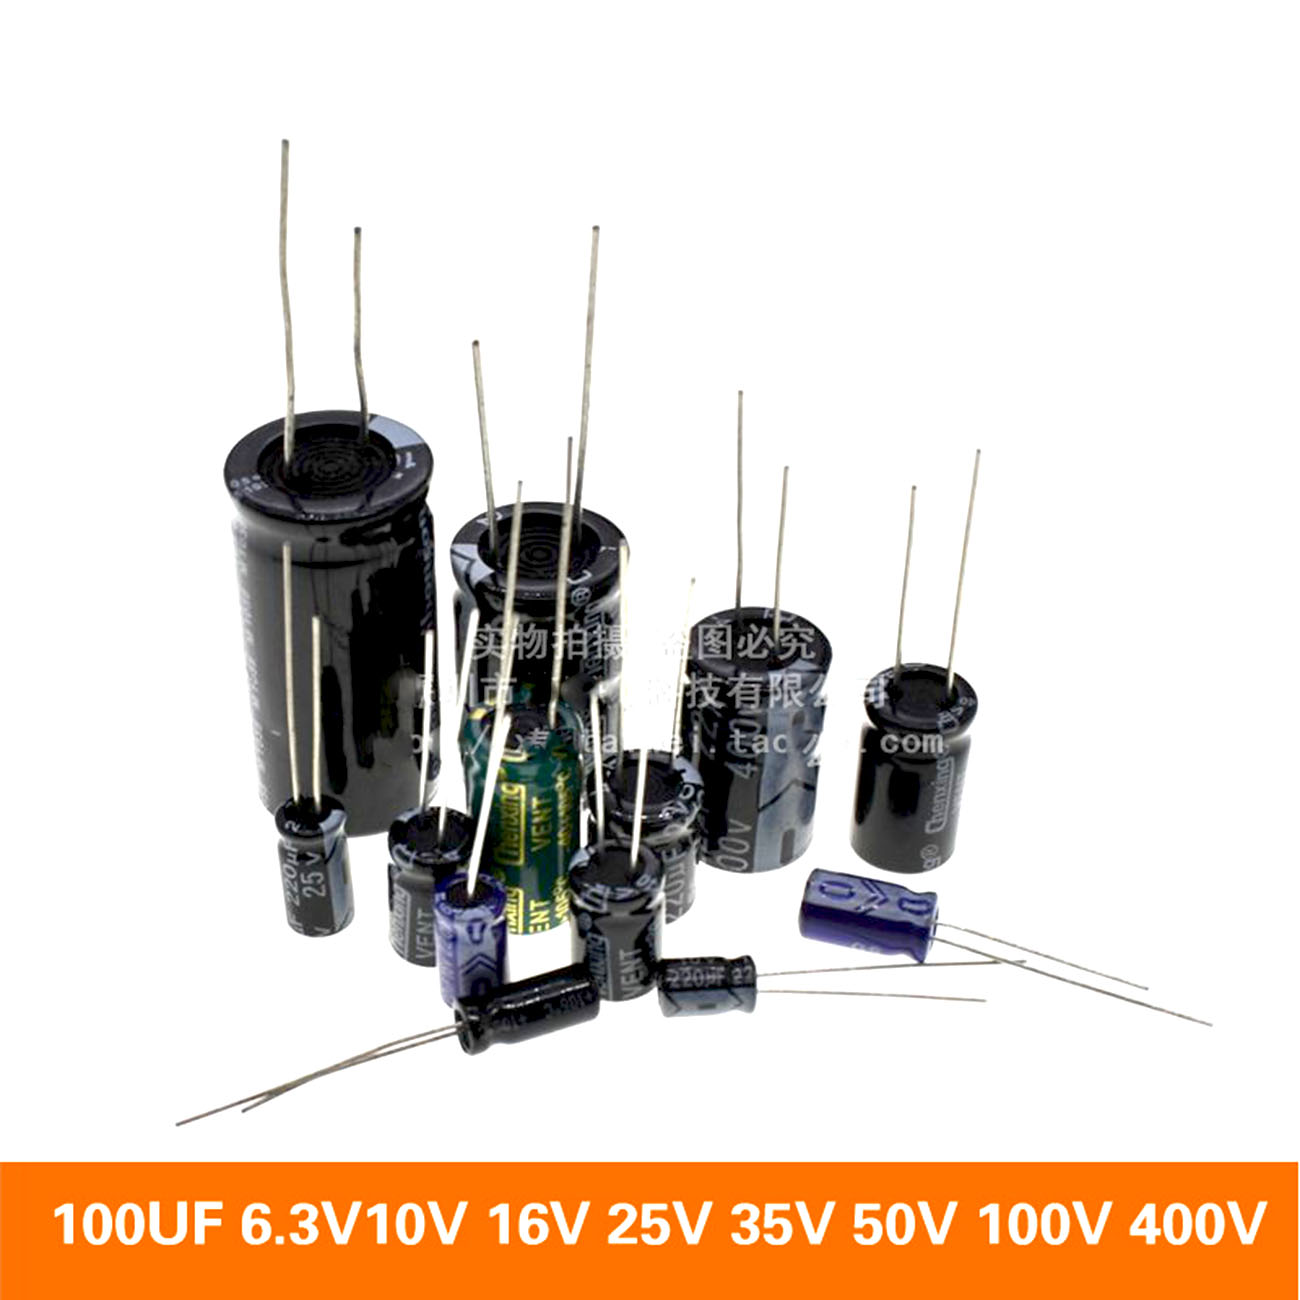 50V 6.8uF 10uF 22uF 33uF 47uF 100uF 220uF 330uF 470uF Electrolytic Capacitor